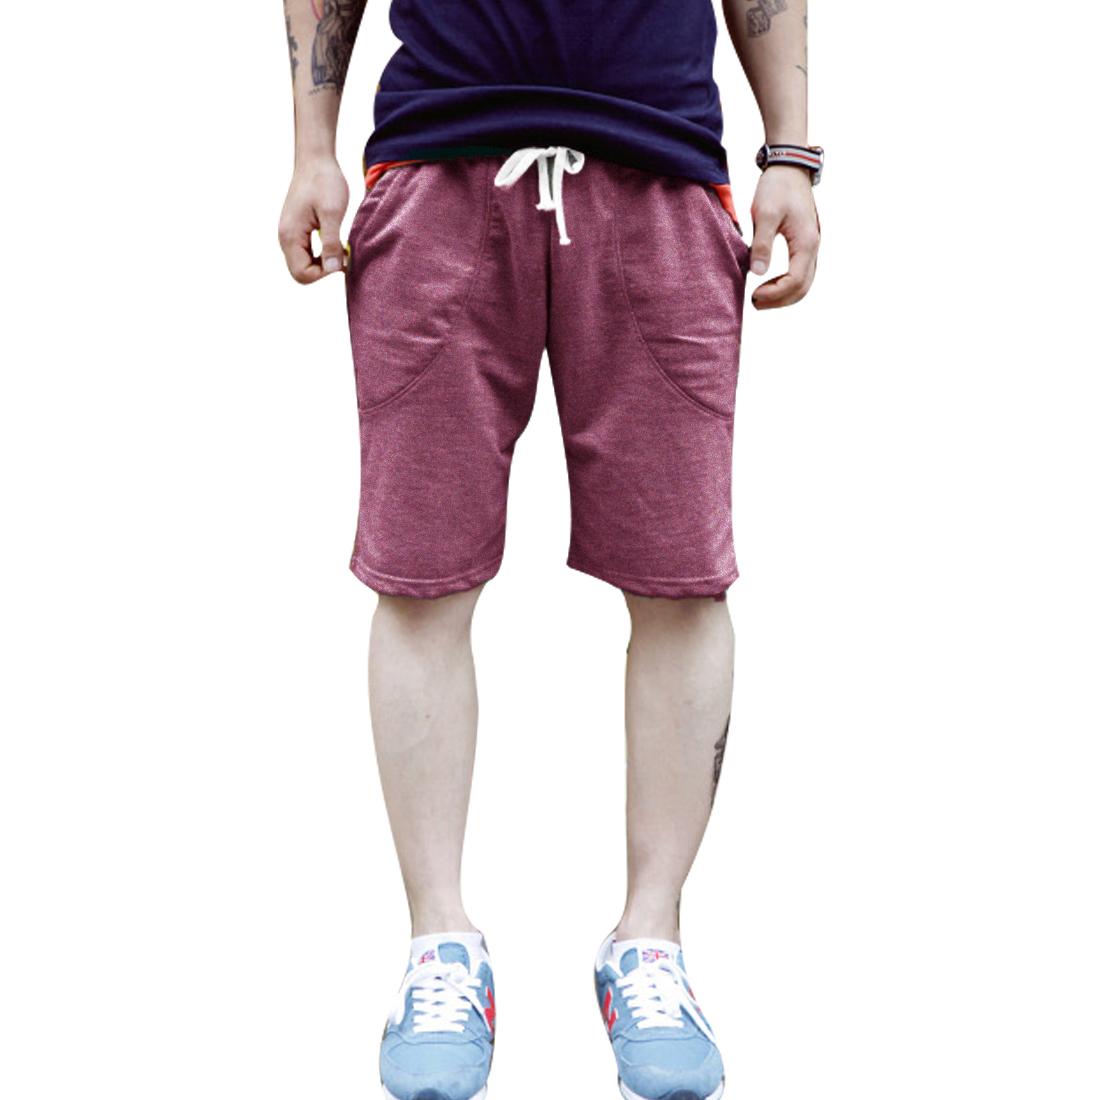 Men Elastic Waist Solid Color Drawstring Summer Casual Shorts Burgundy W32